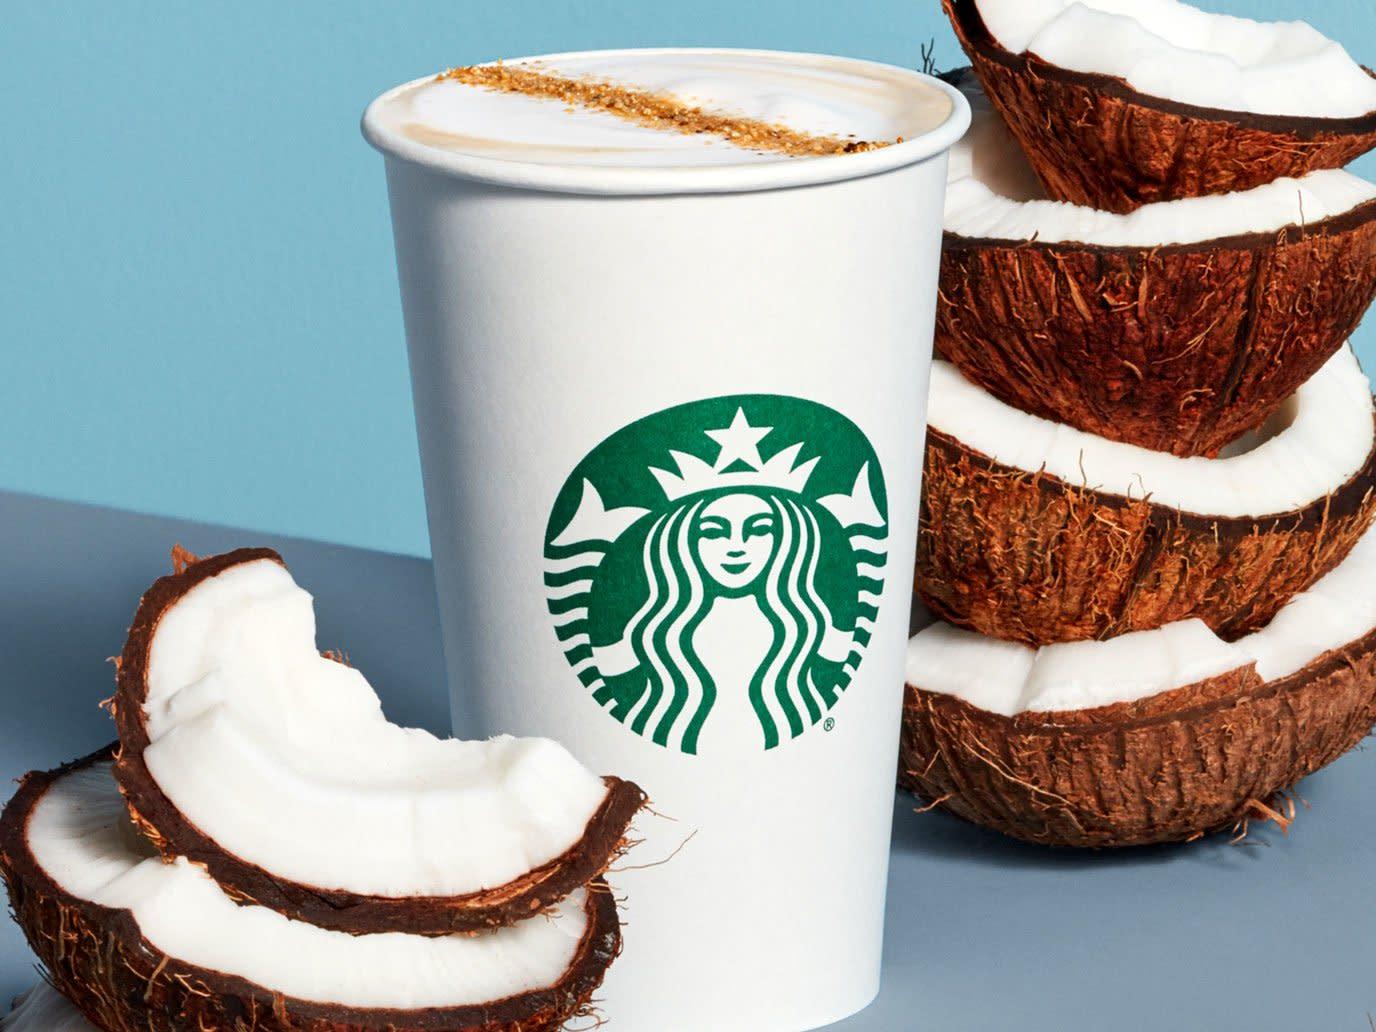 Hasil gambar untuk Starbucks Now Has Two New Non-dairy Drinks on Its Menu